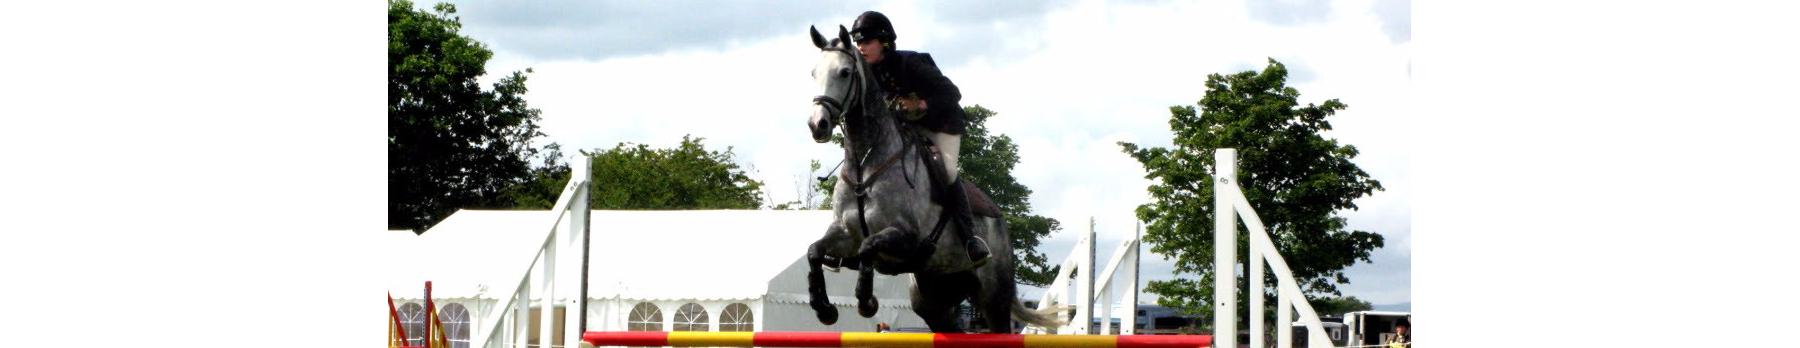 Equestrian Trophies & Medals